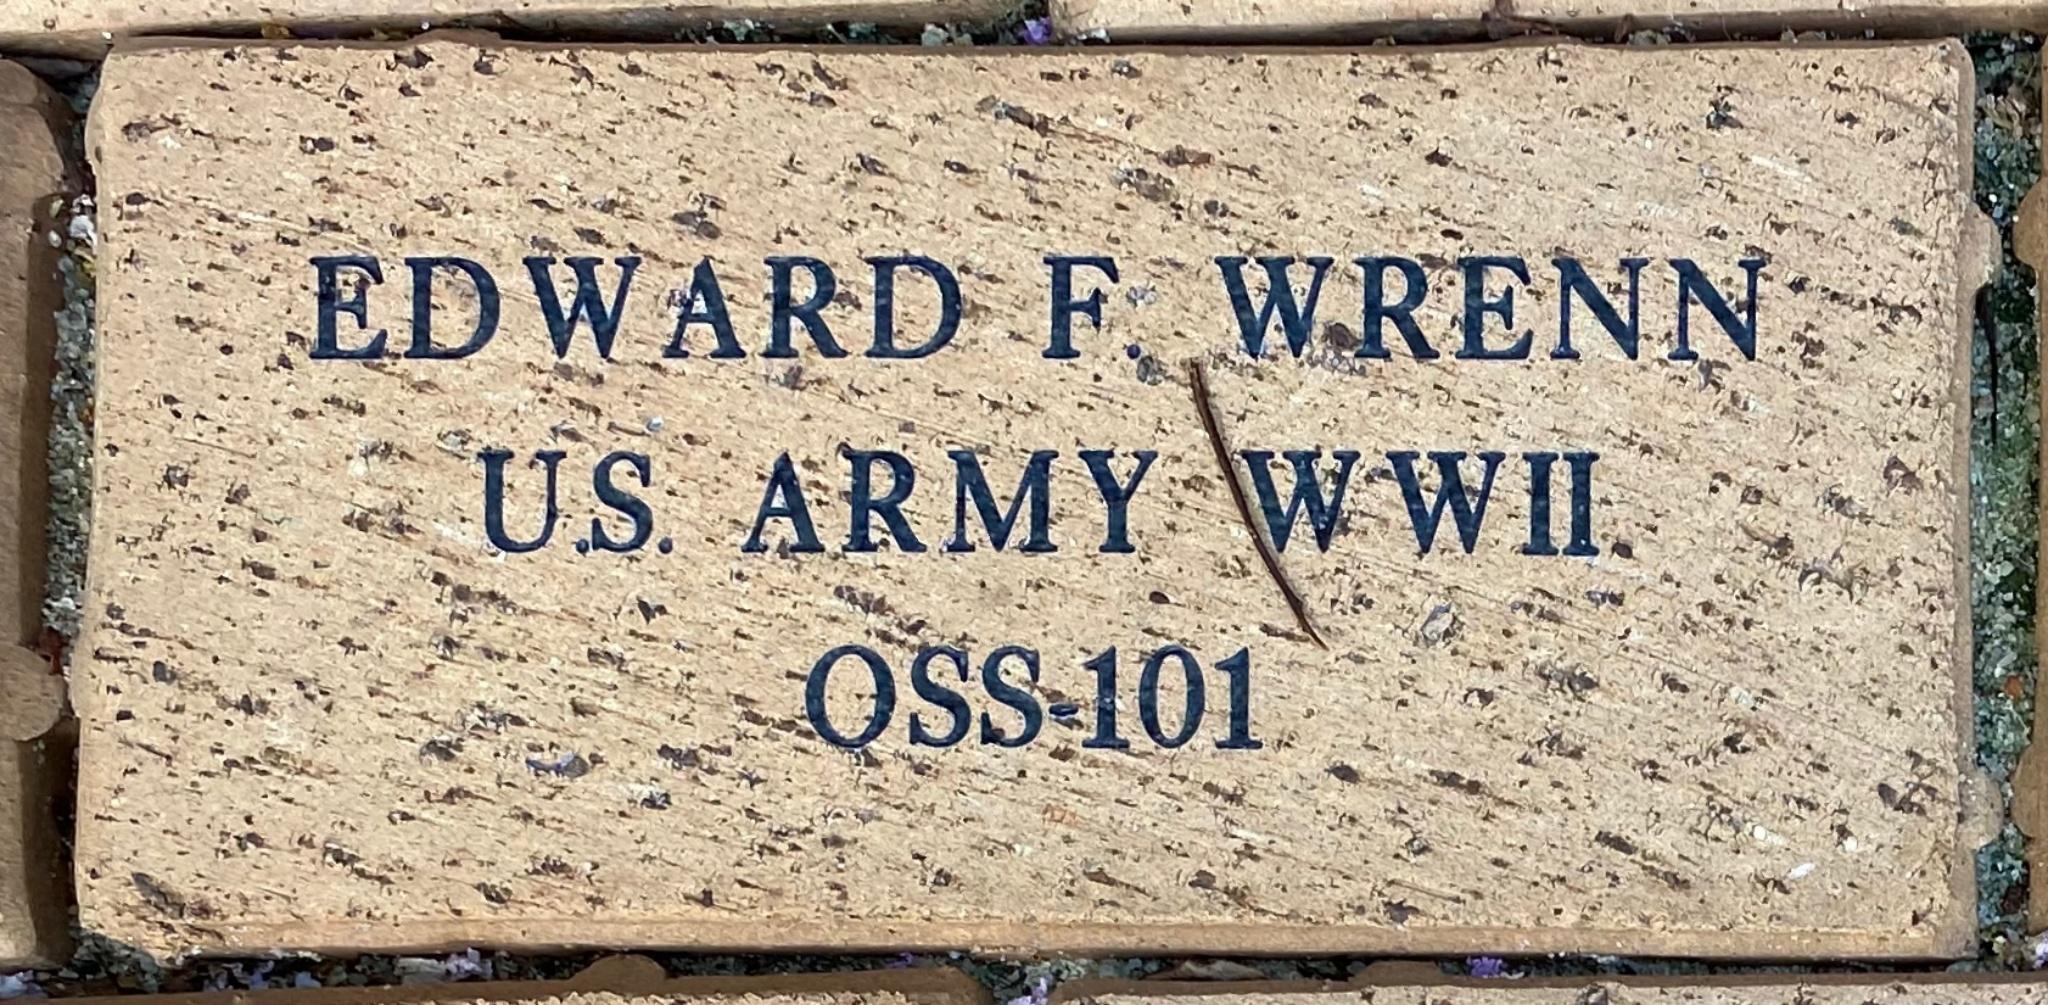 EDWARD F. WRENN U.S. ARMY WWII OSS-101